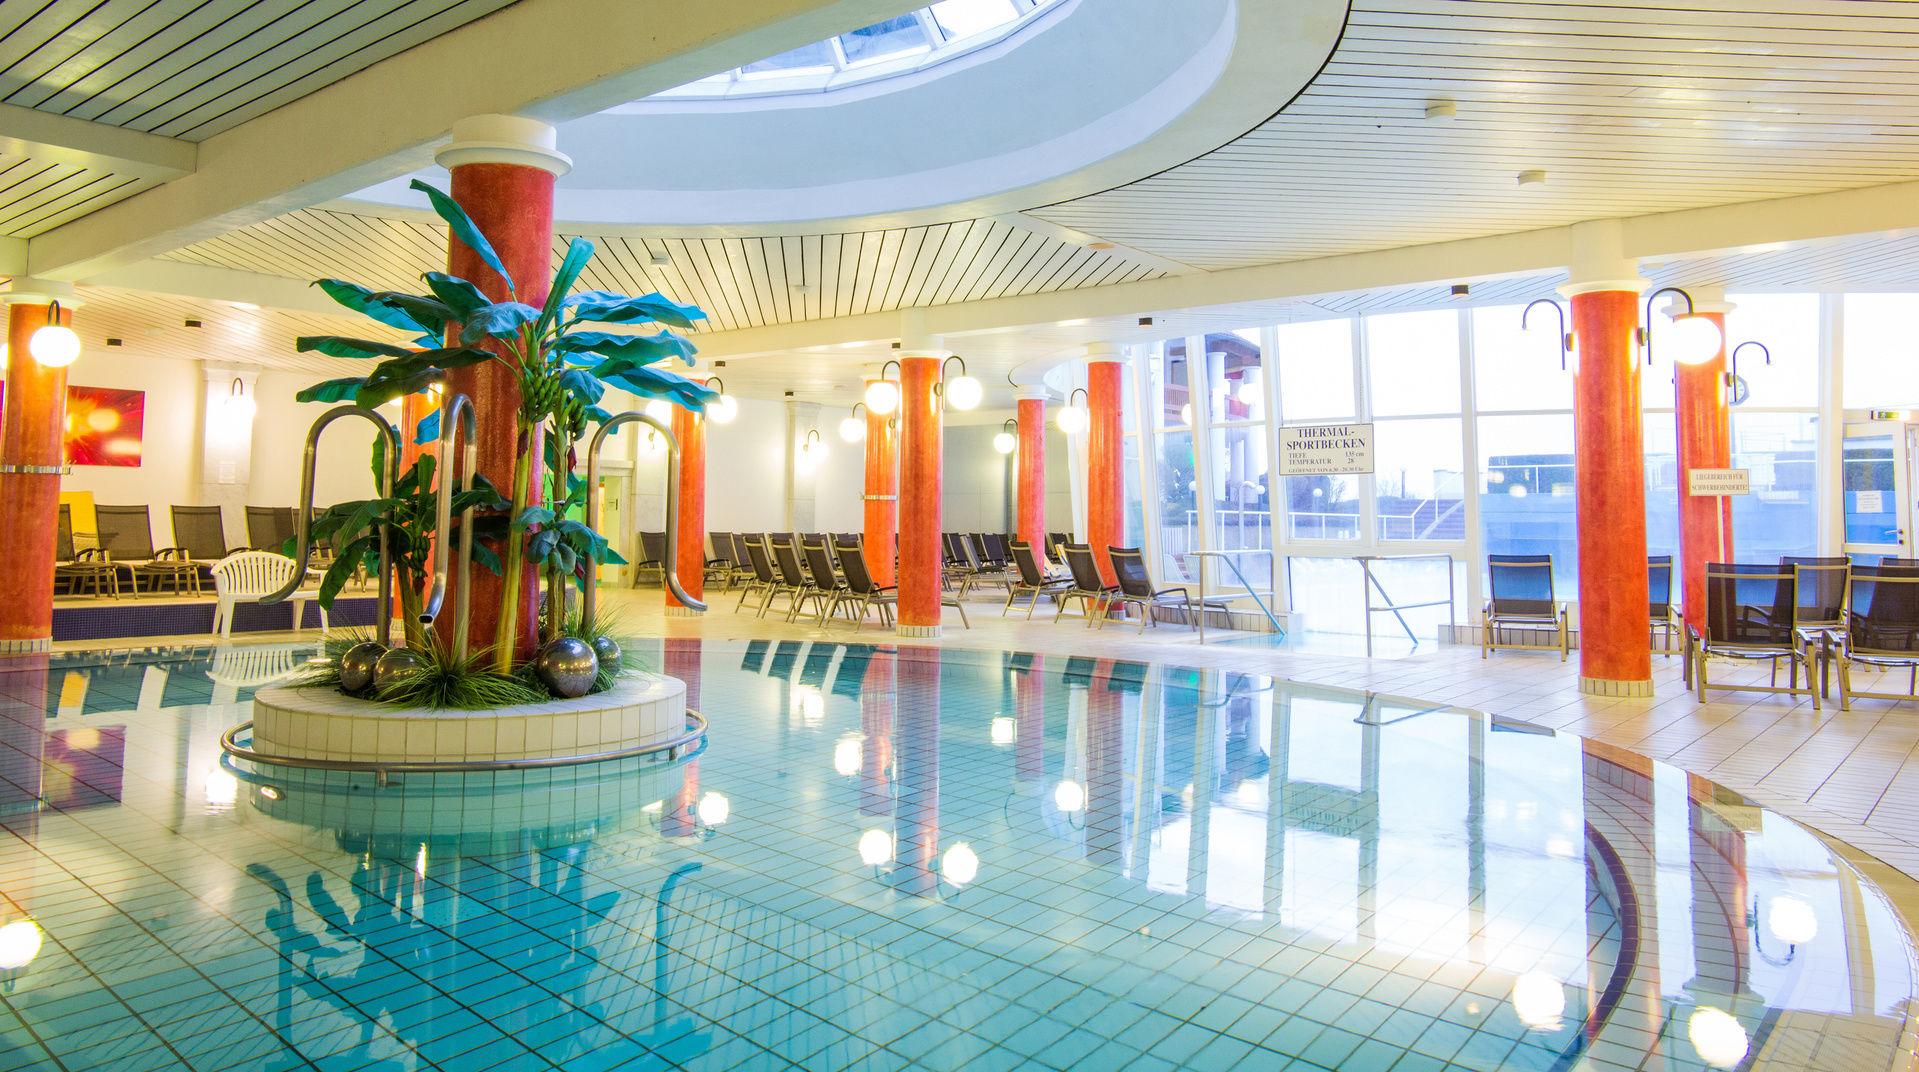 Whirlpool Bad Griesbach : Quellness wellness holidays 3 stars hotel konradshof spa holiday